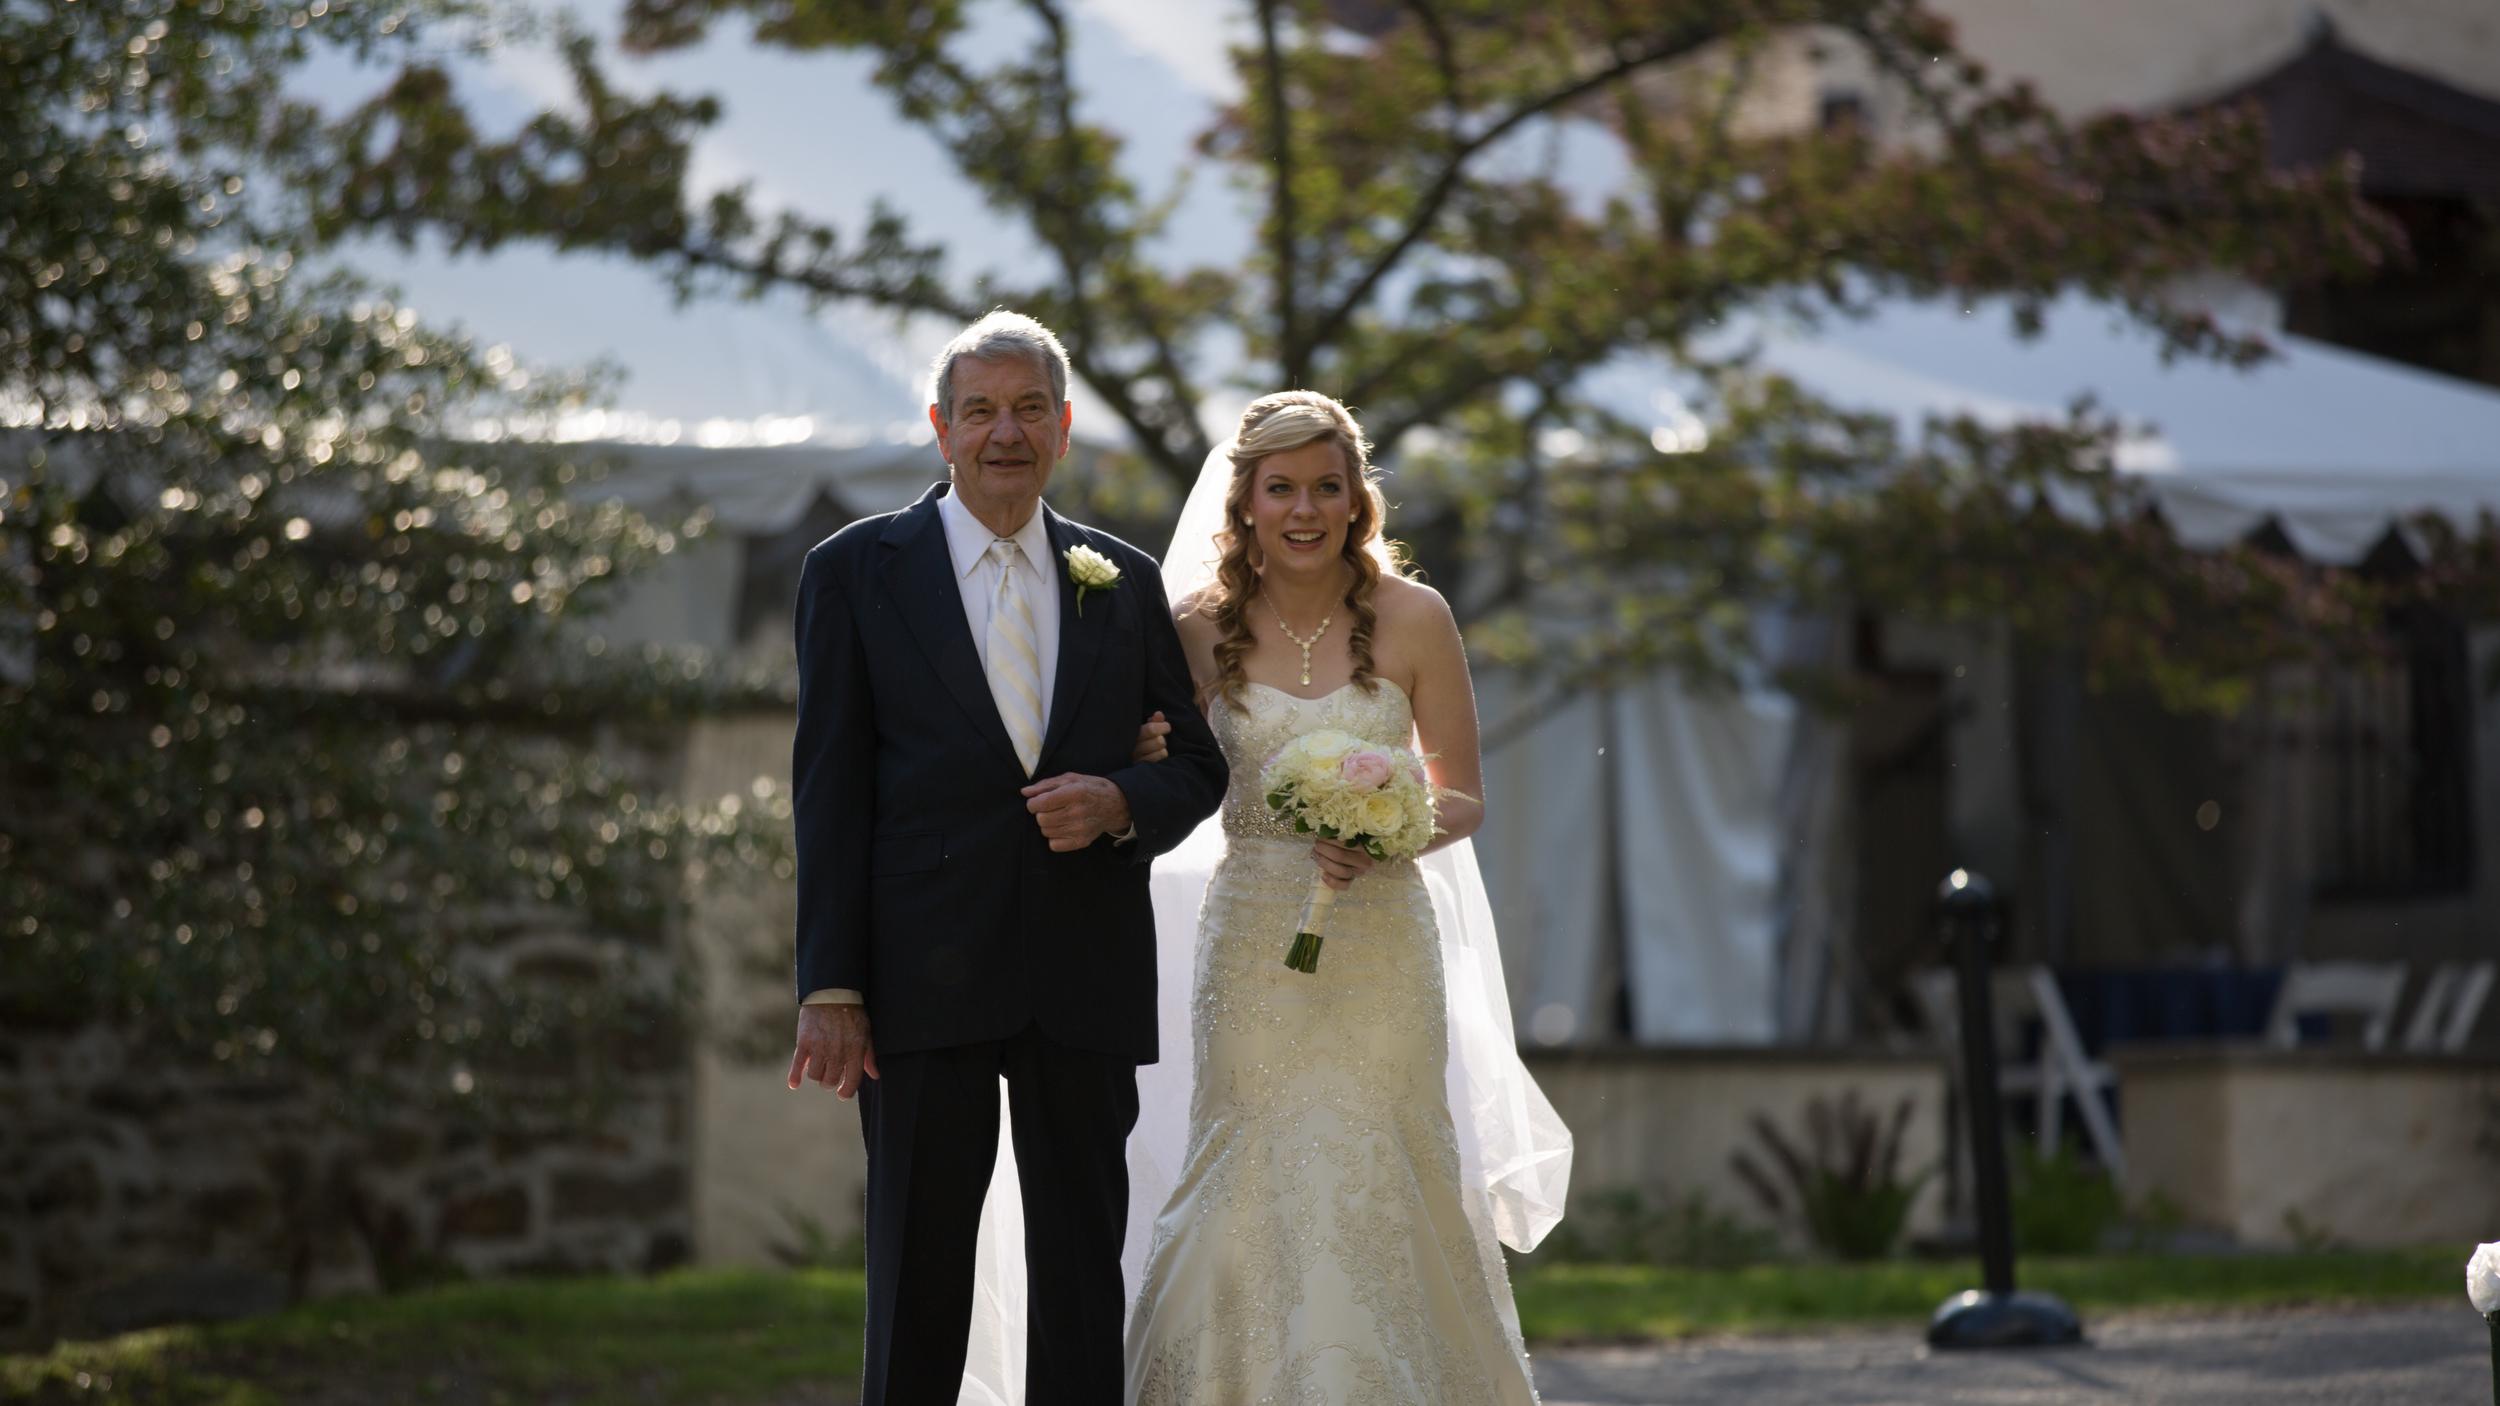 Dana and her grandpa